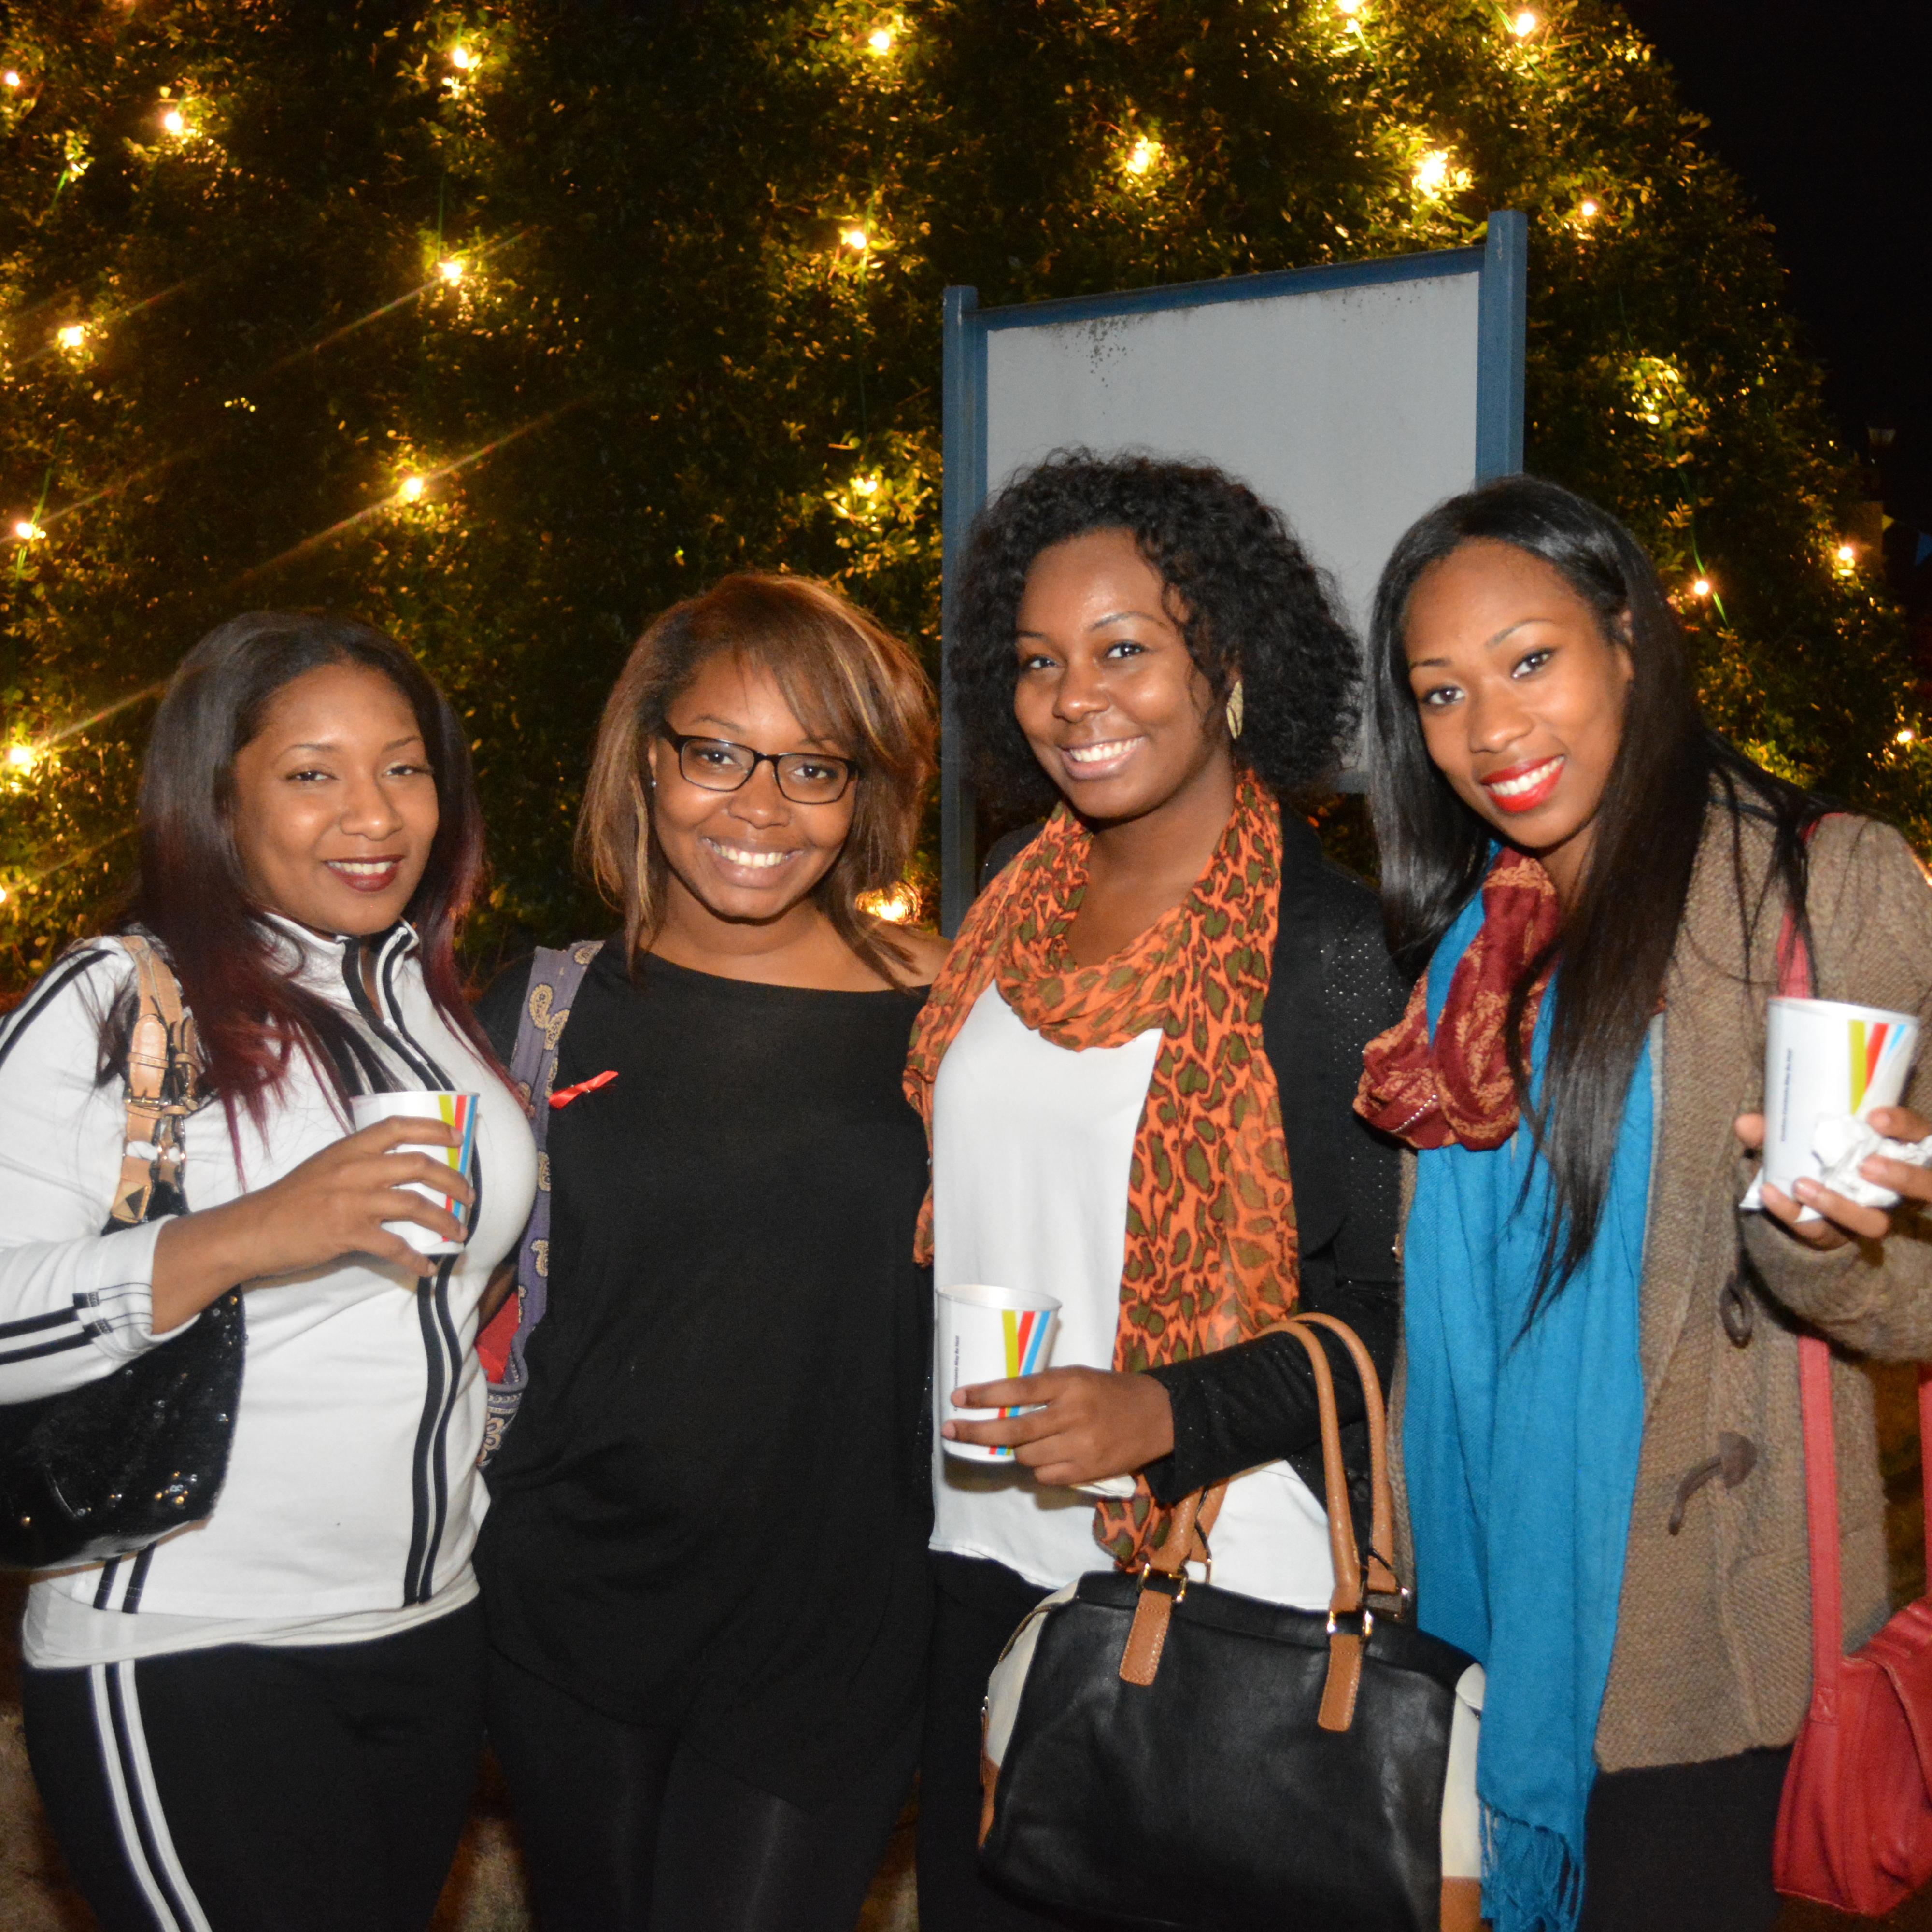 Students at FVSU Christmas tree lighting.